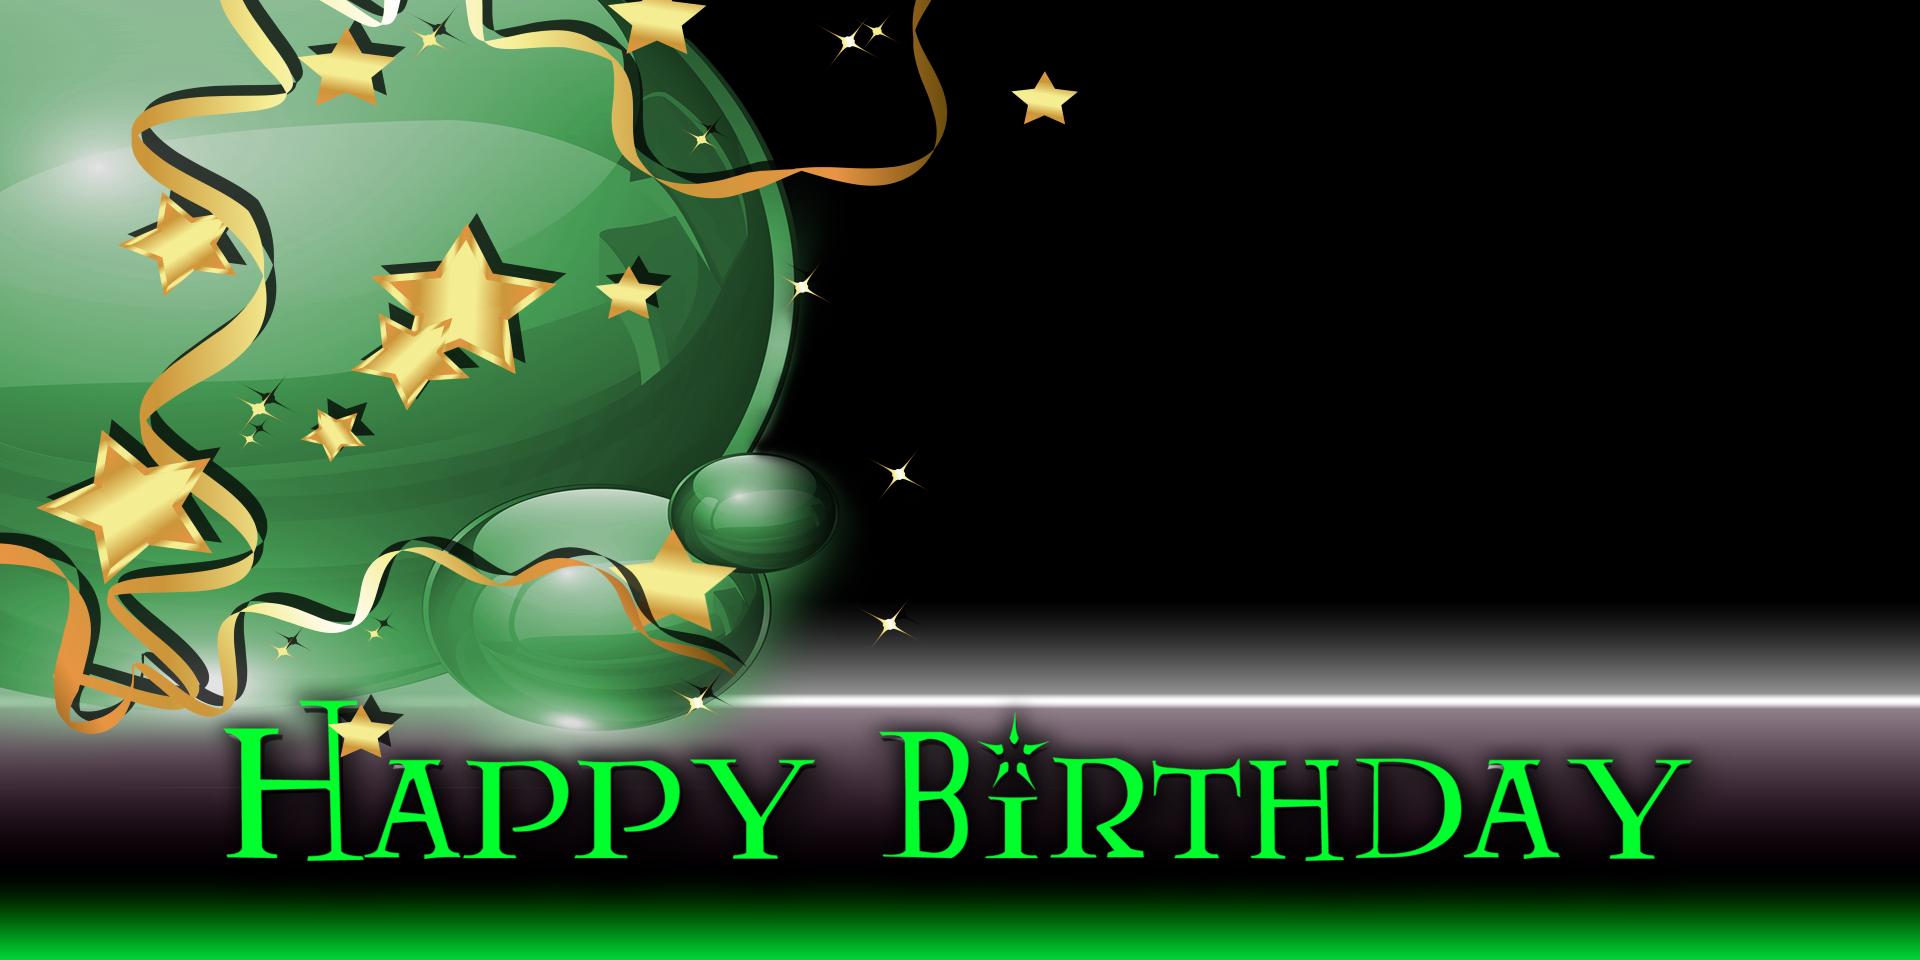 Happy Birthday Banner - Star Balloon Green - Vinyl Banners ...